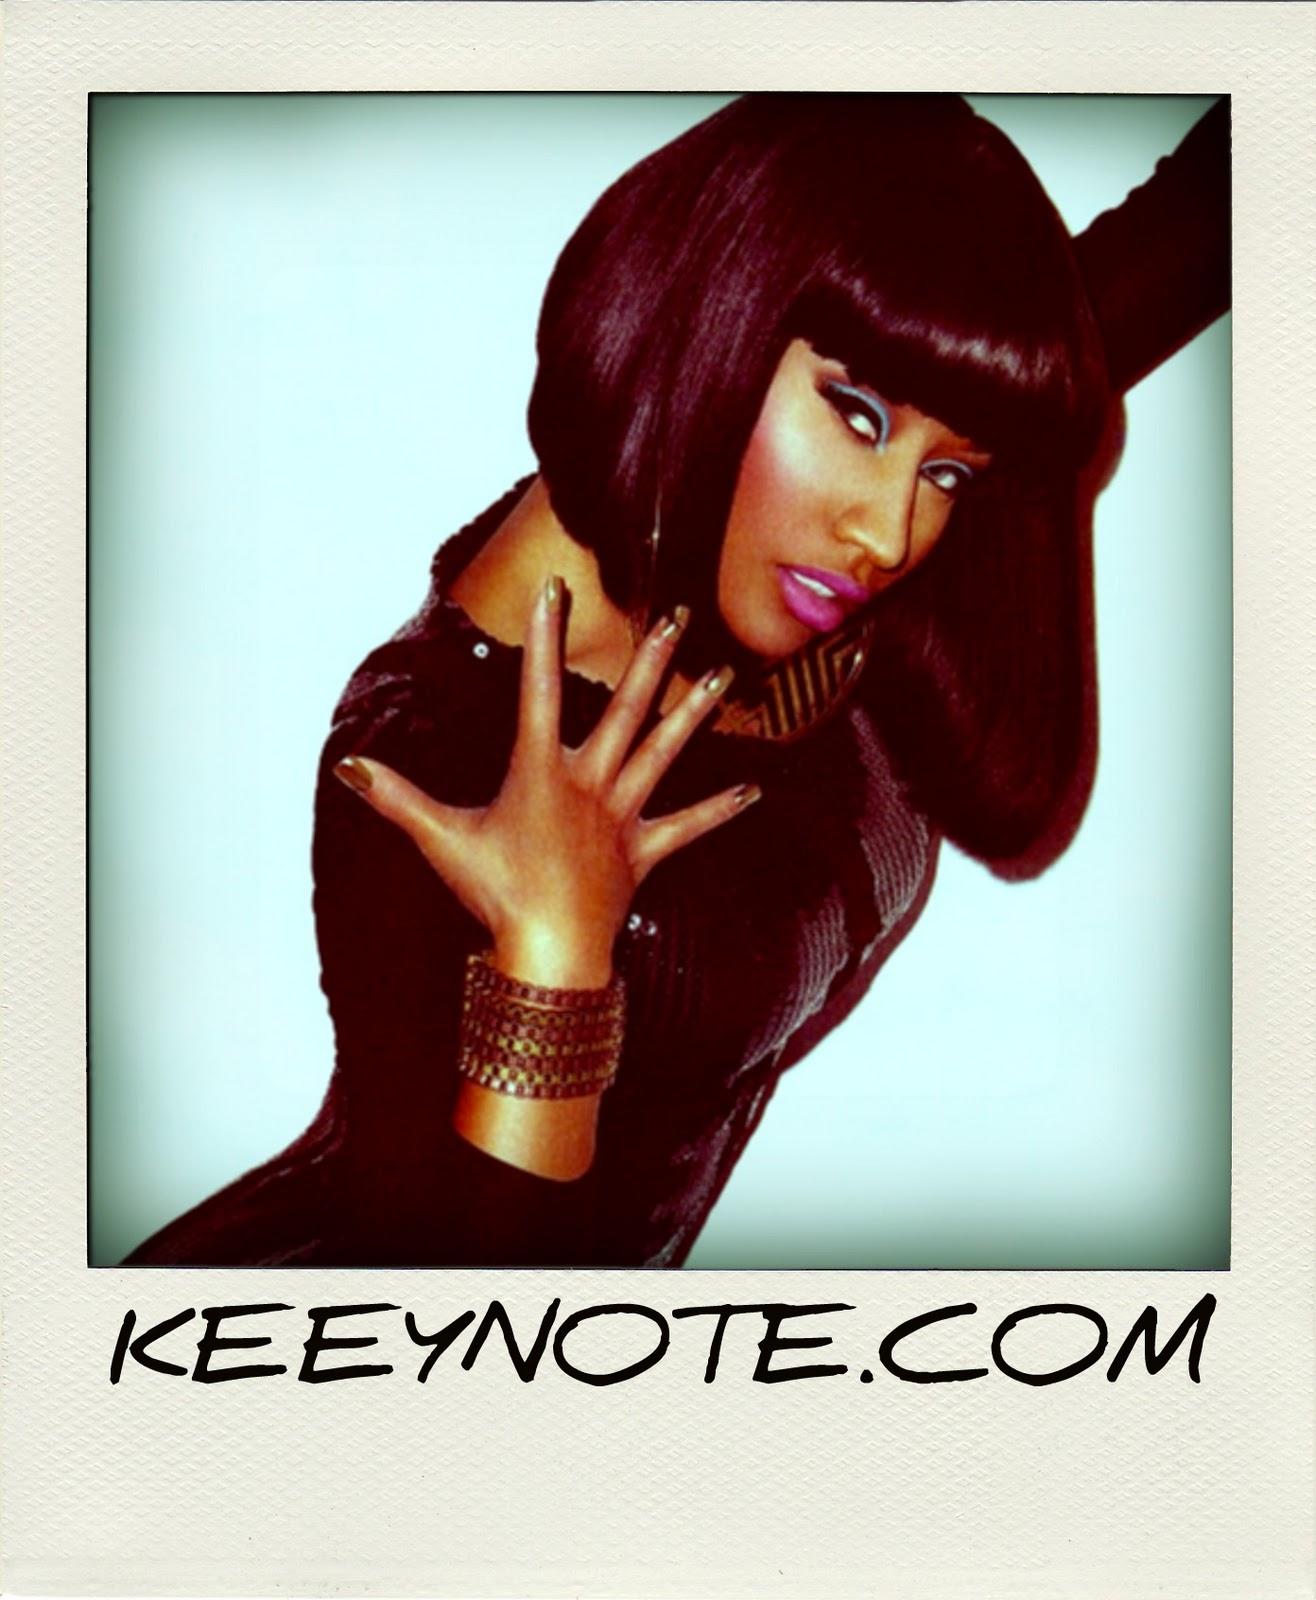 http://1.bp.blogspot.com/-1sB8Ln3skJk/Tt7ykawcQqI/AAAAAAAAEvs/ZgS-EIN99sc/s1600/new-nicki-minaj-songs-break-billboard-top-songs-chart-records-2-pola.jpg